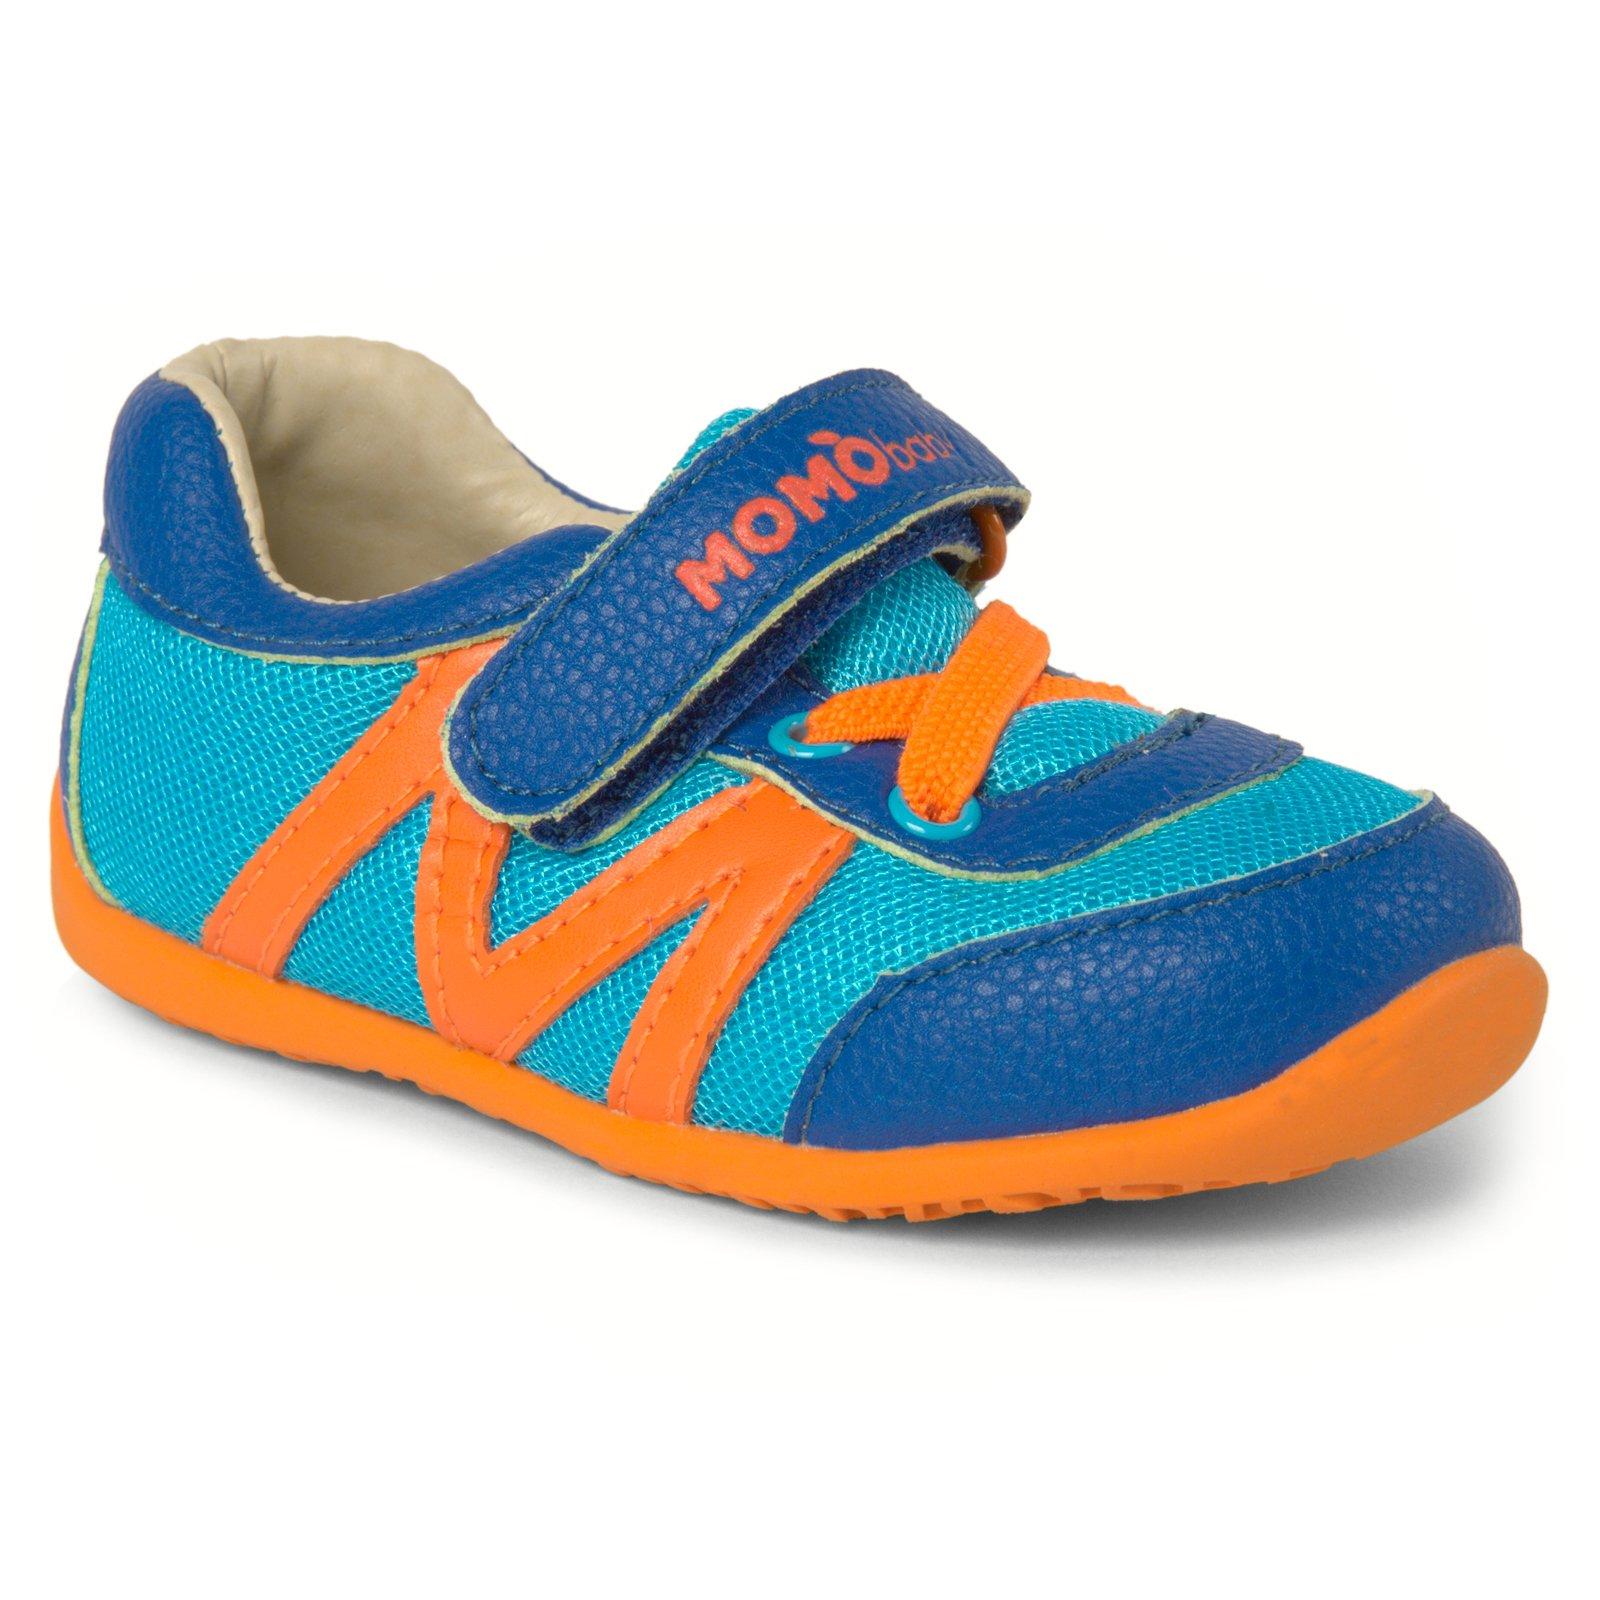 Momo Baby Boys First Walker/Toddler Hunter Sneaker Shoes - 5 M US Toddler